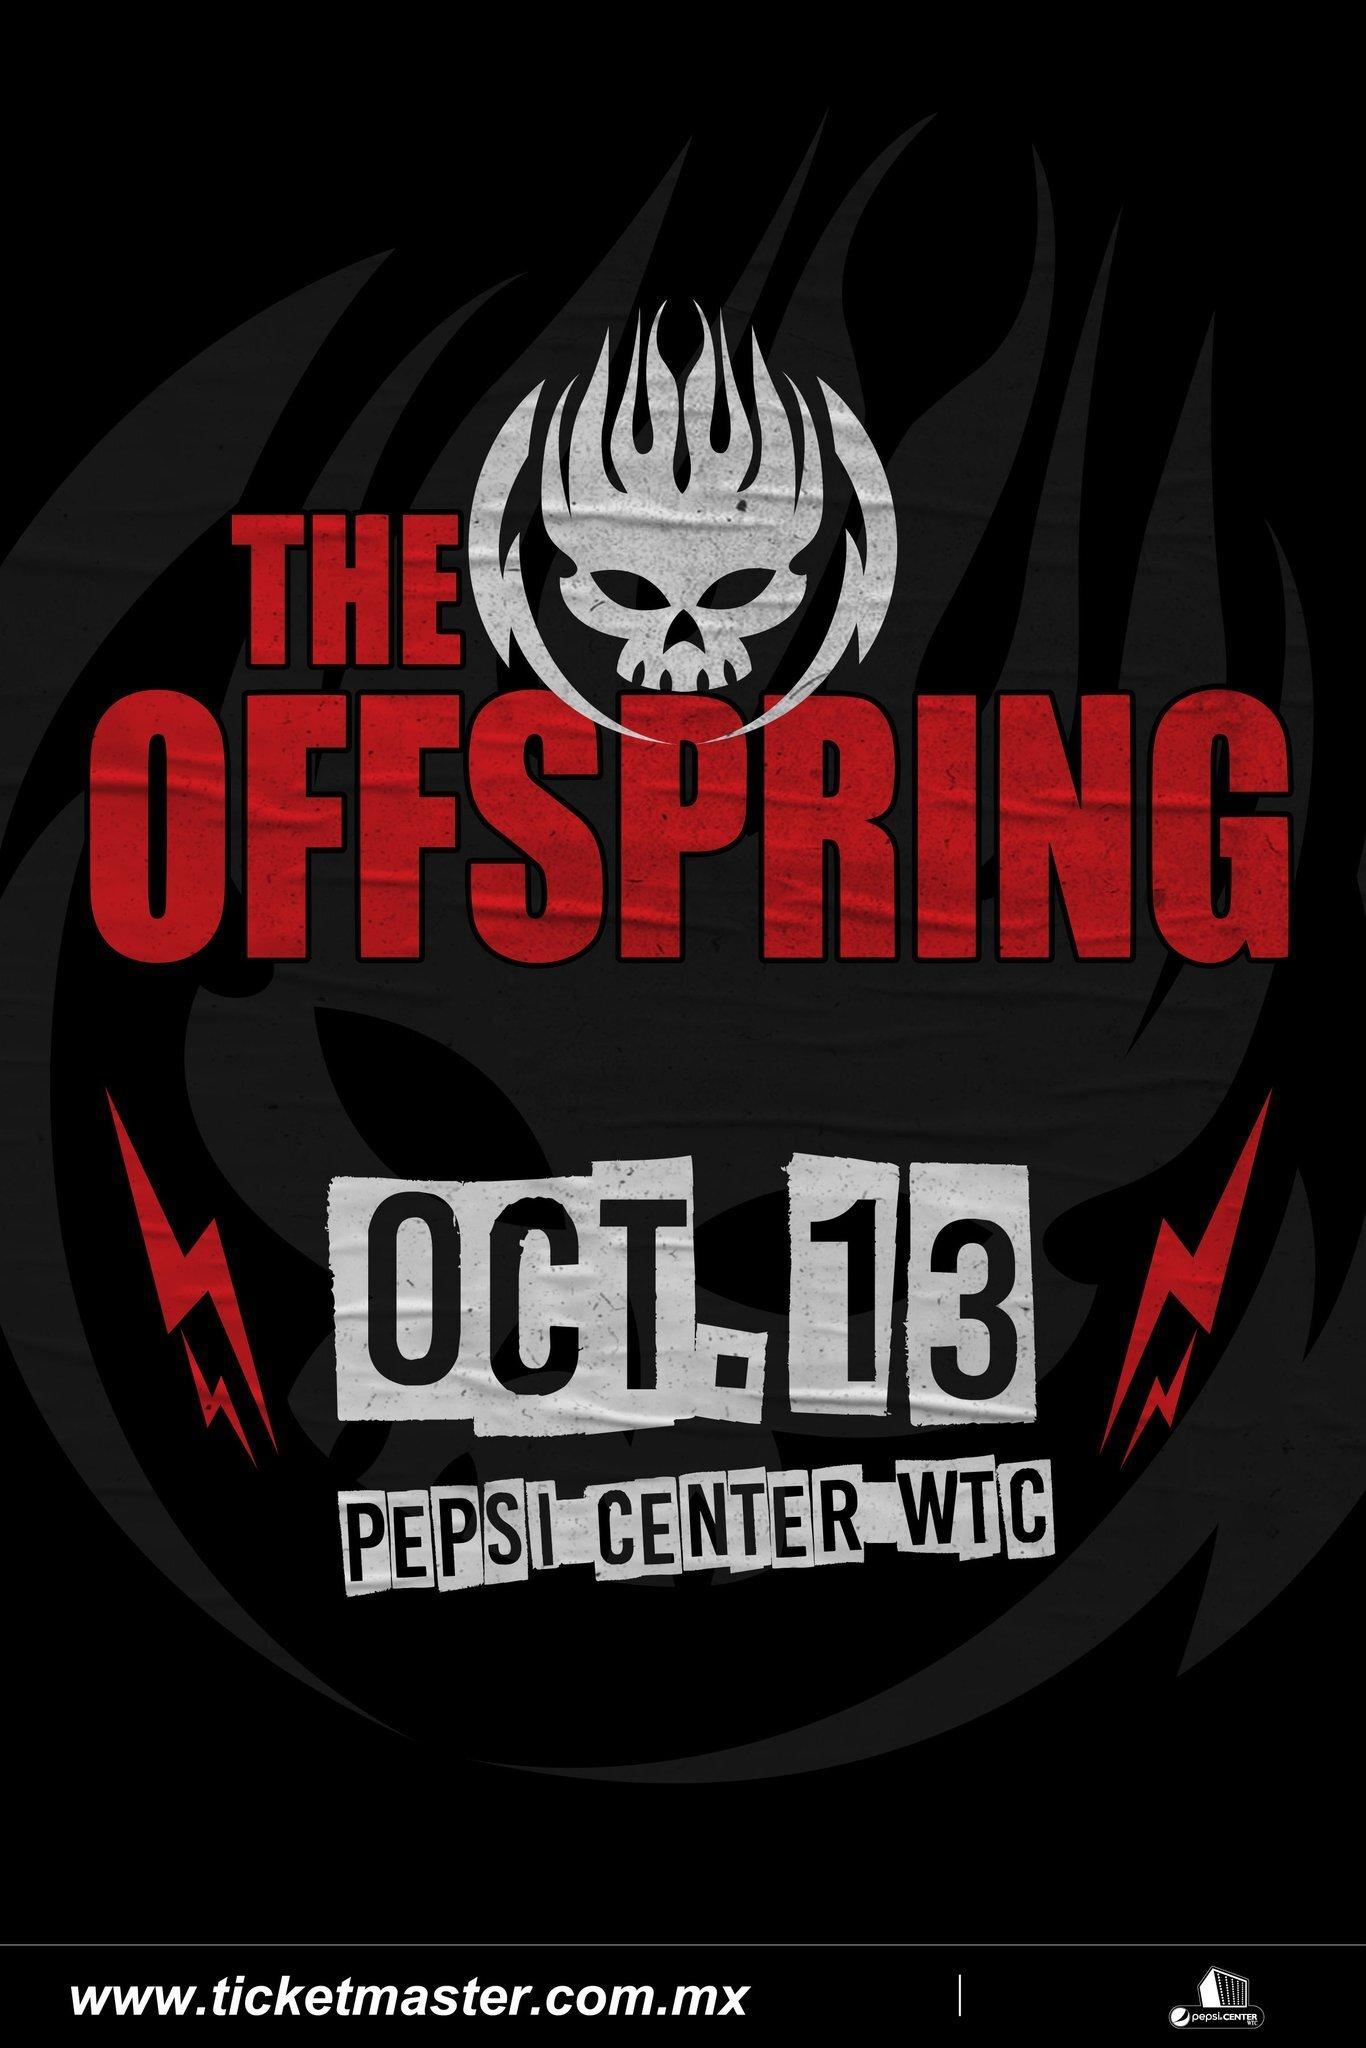 The Offspring Pepsi Center wtc.jpg